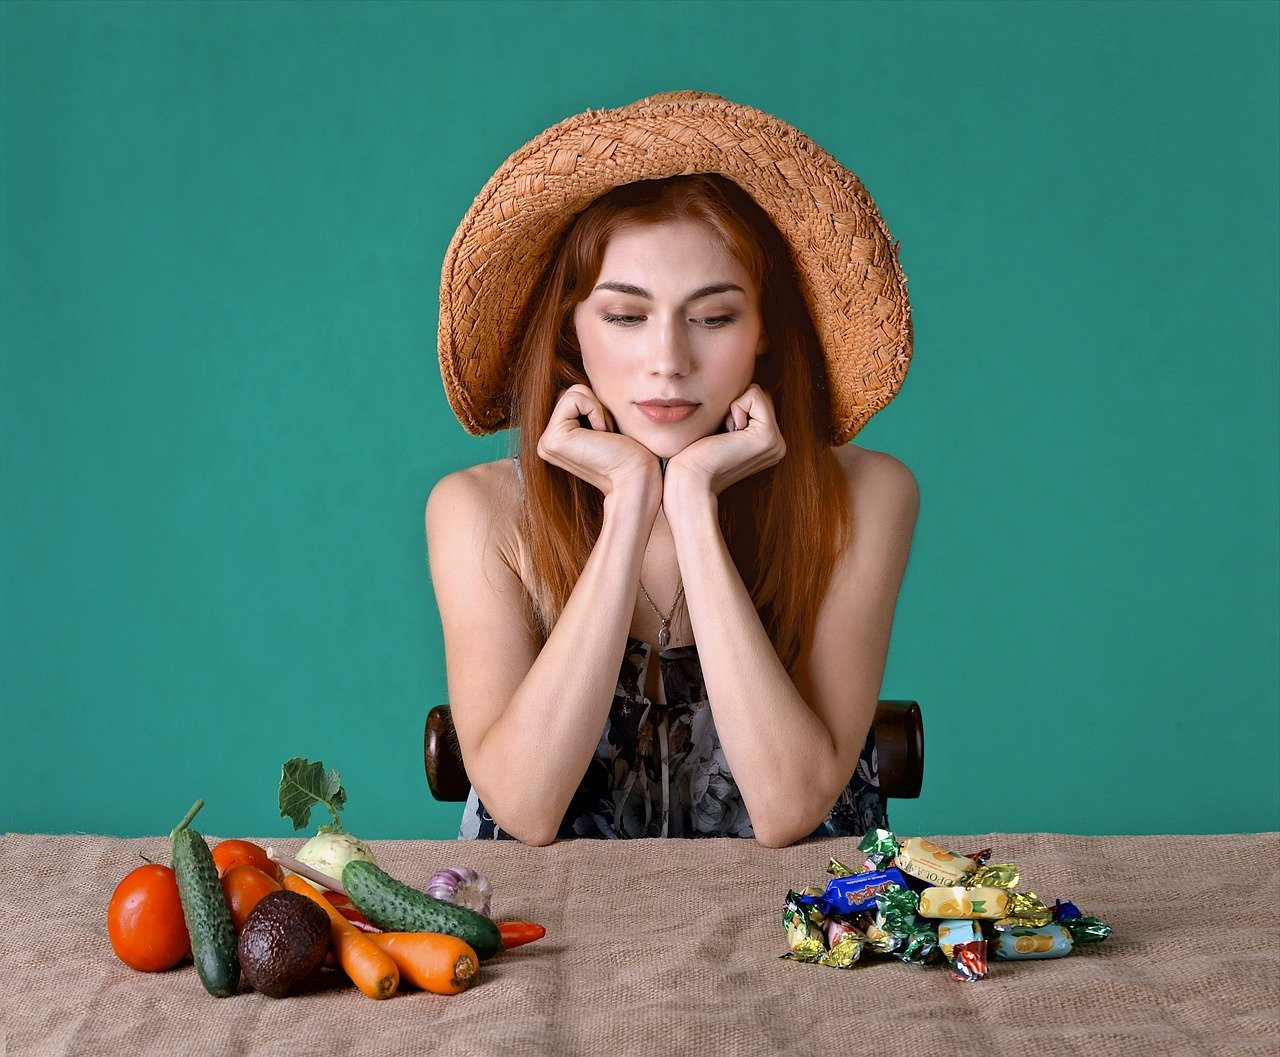 A dieta: ¿se puede picar entre horas?